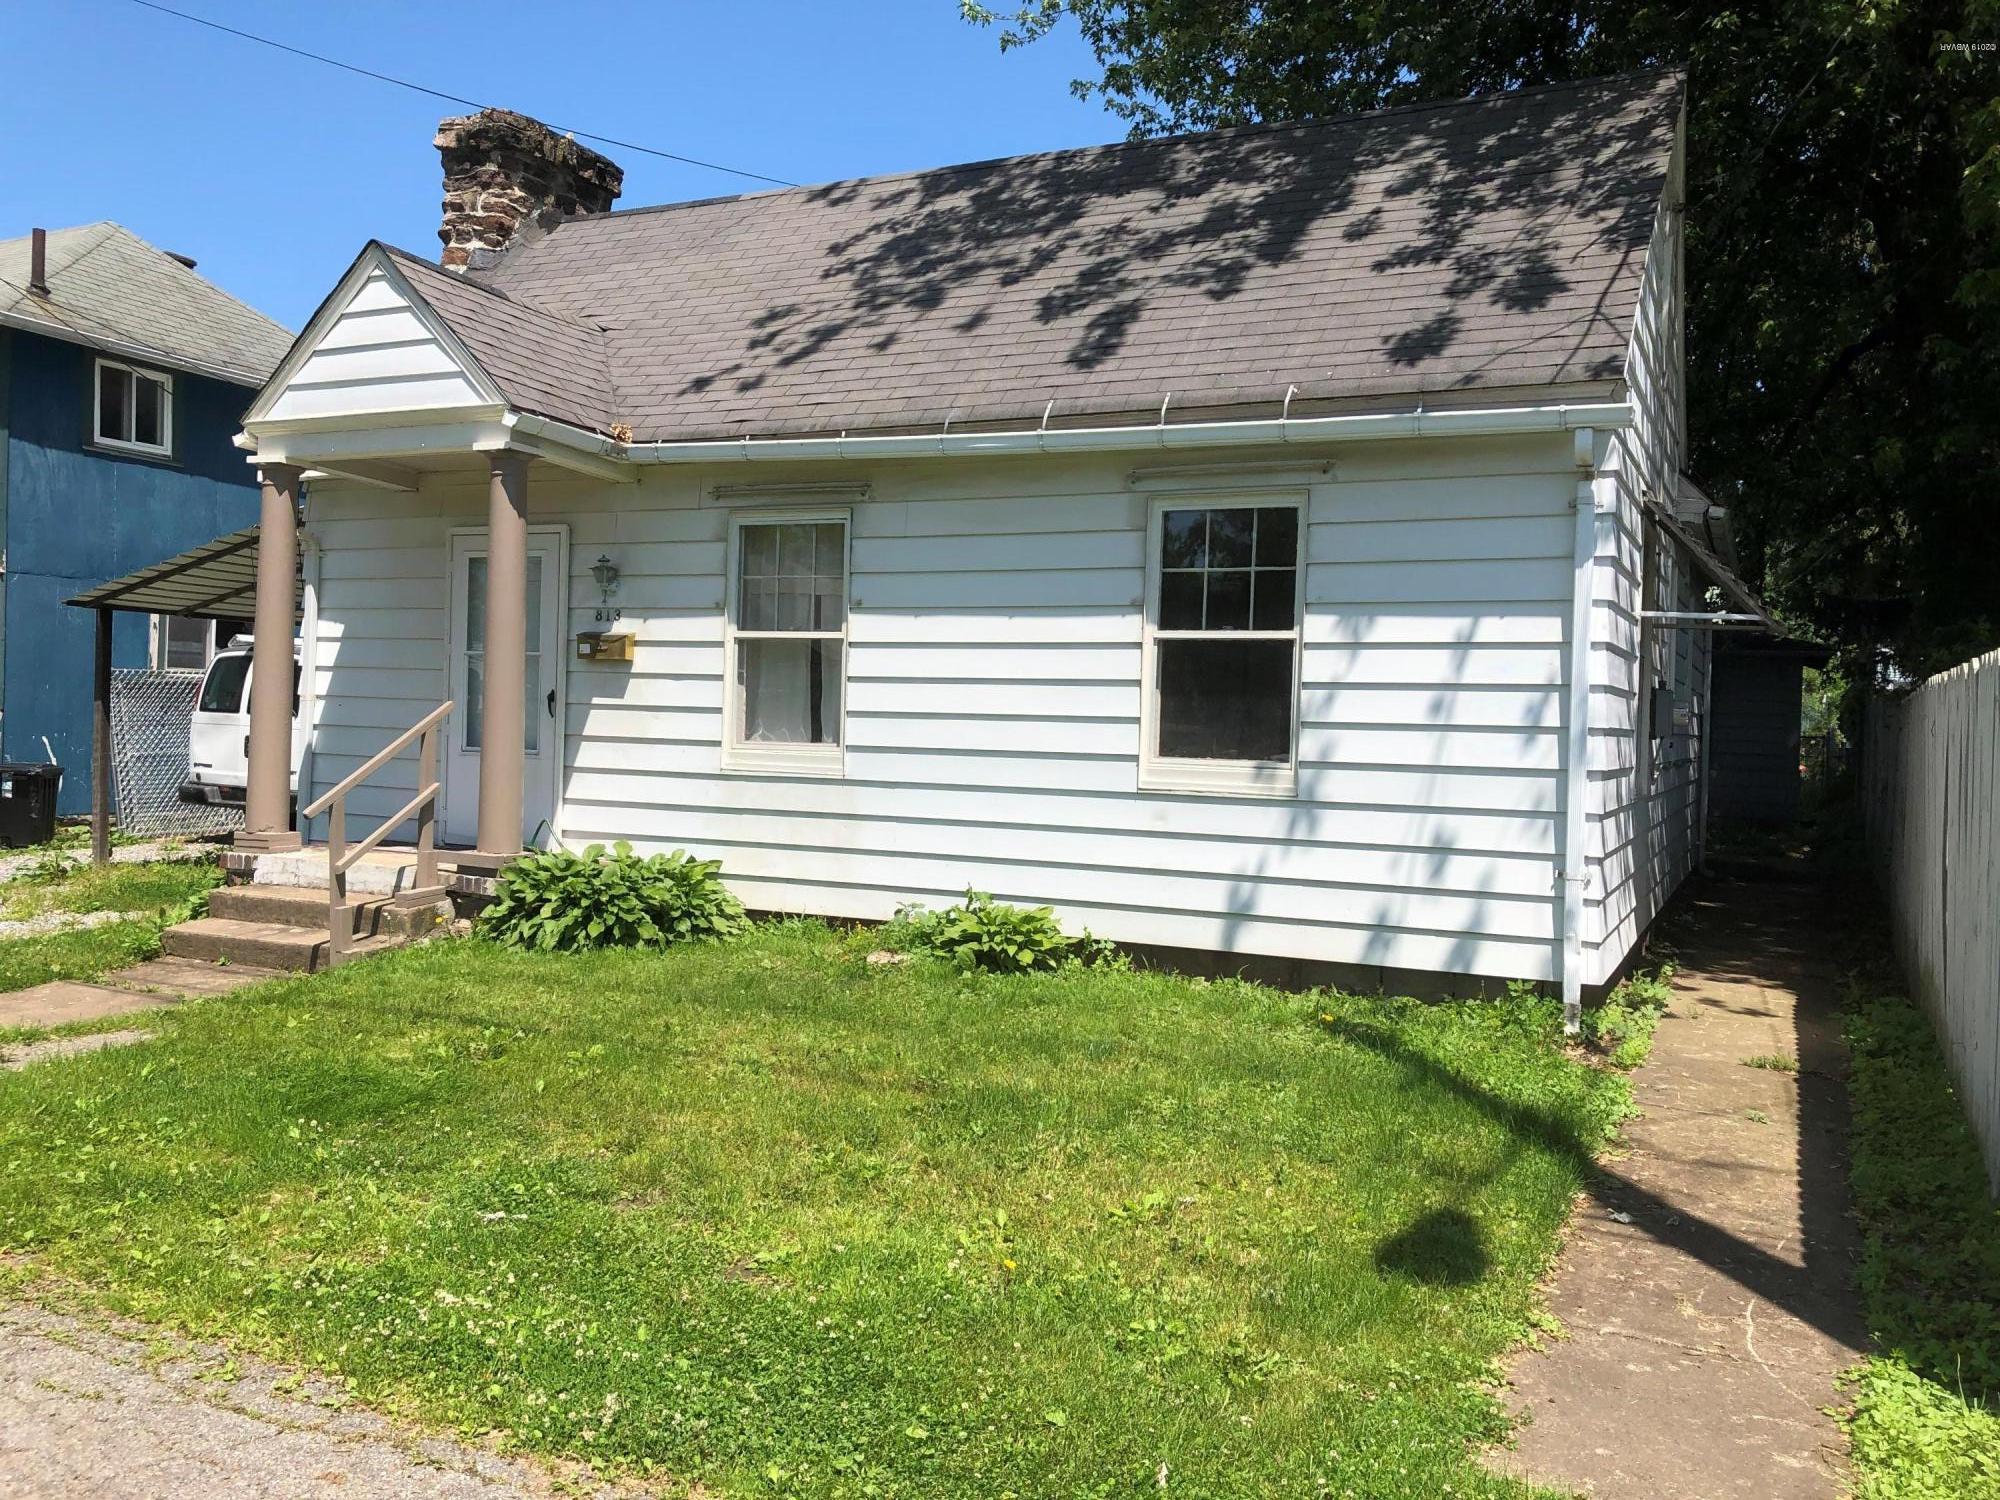 813 BRANDON PLACE,Williamsport,PA 17701,1 Bedroom Bedrooms,Residential,BRANDON,WB-87533